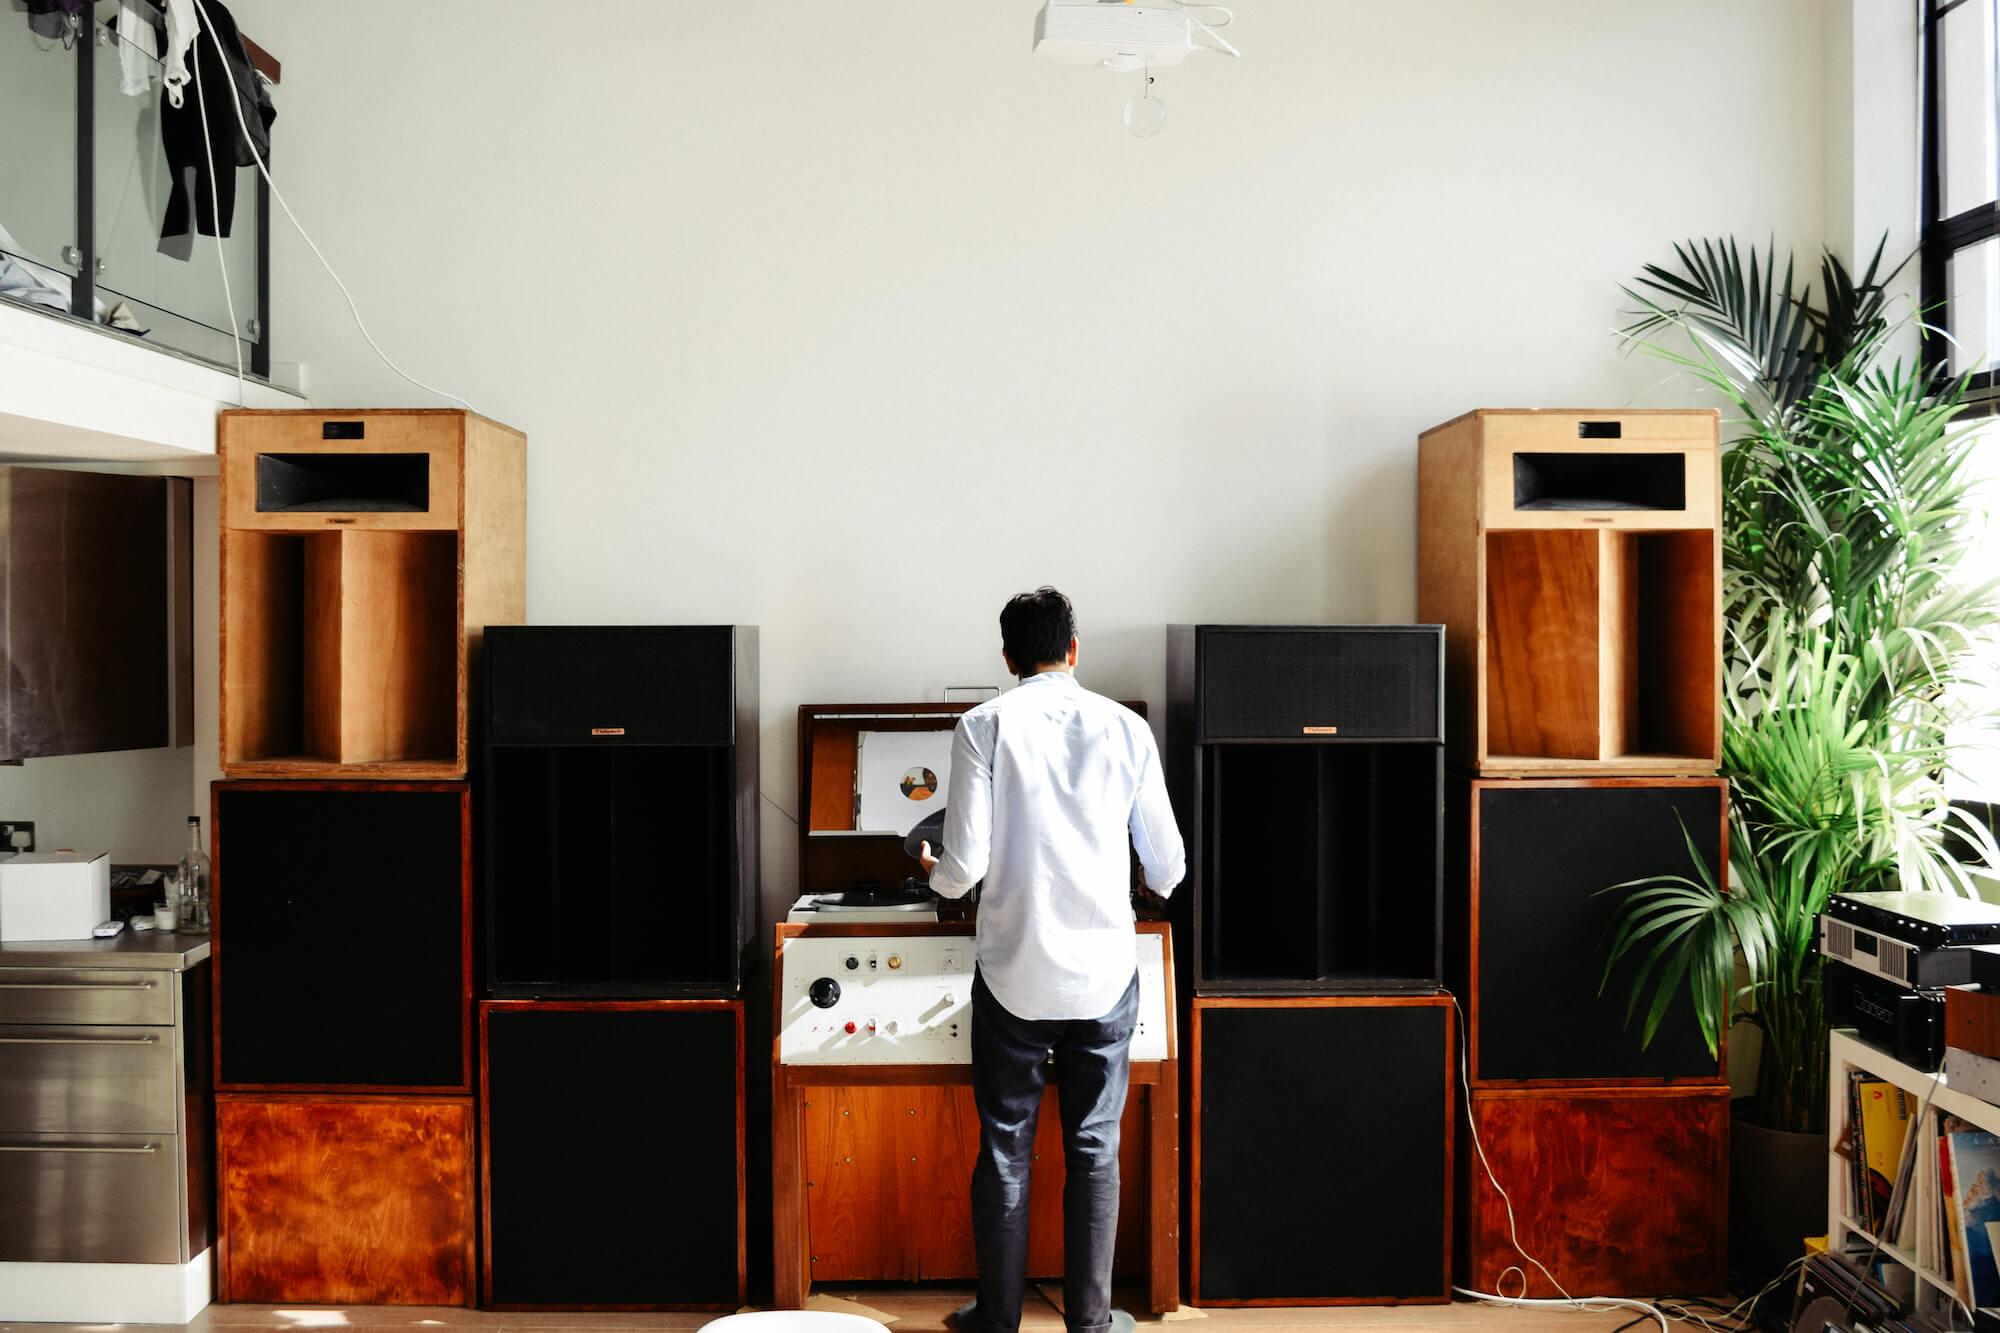 Brilliant Corners' custom sound system & BBC Technics turntable console